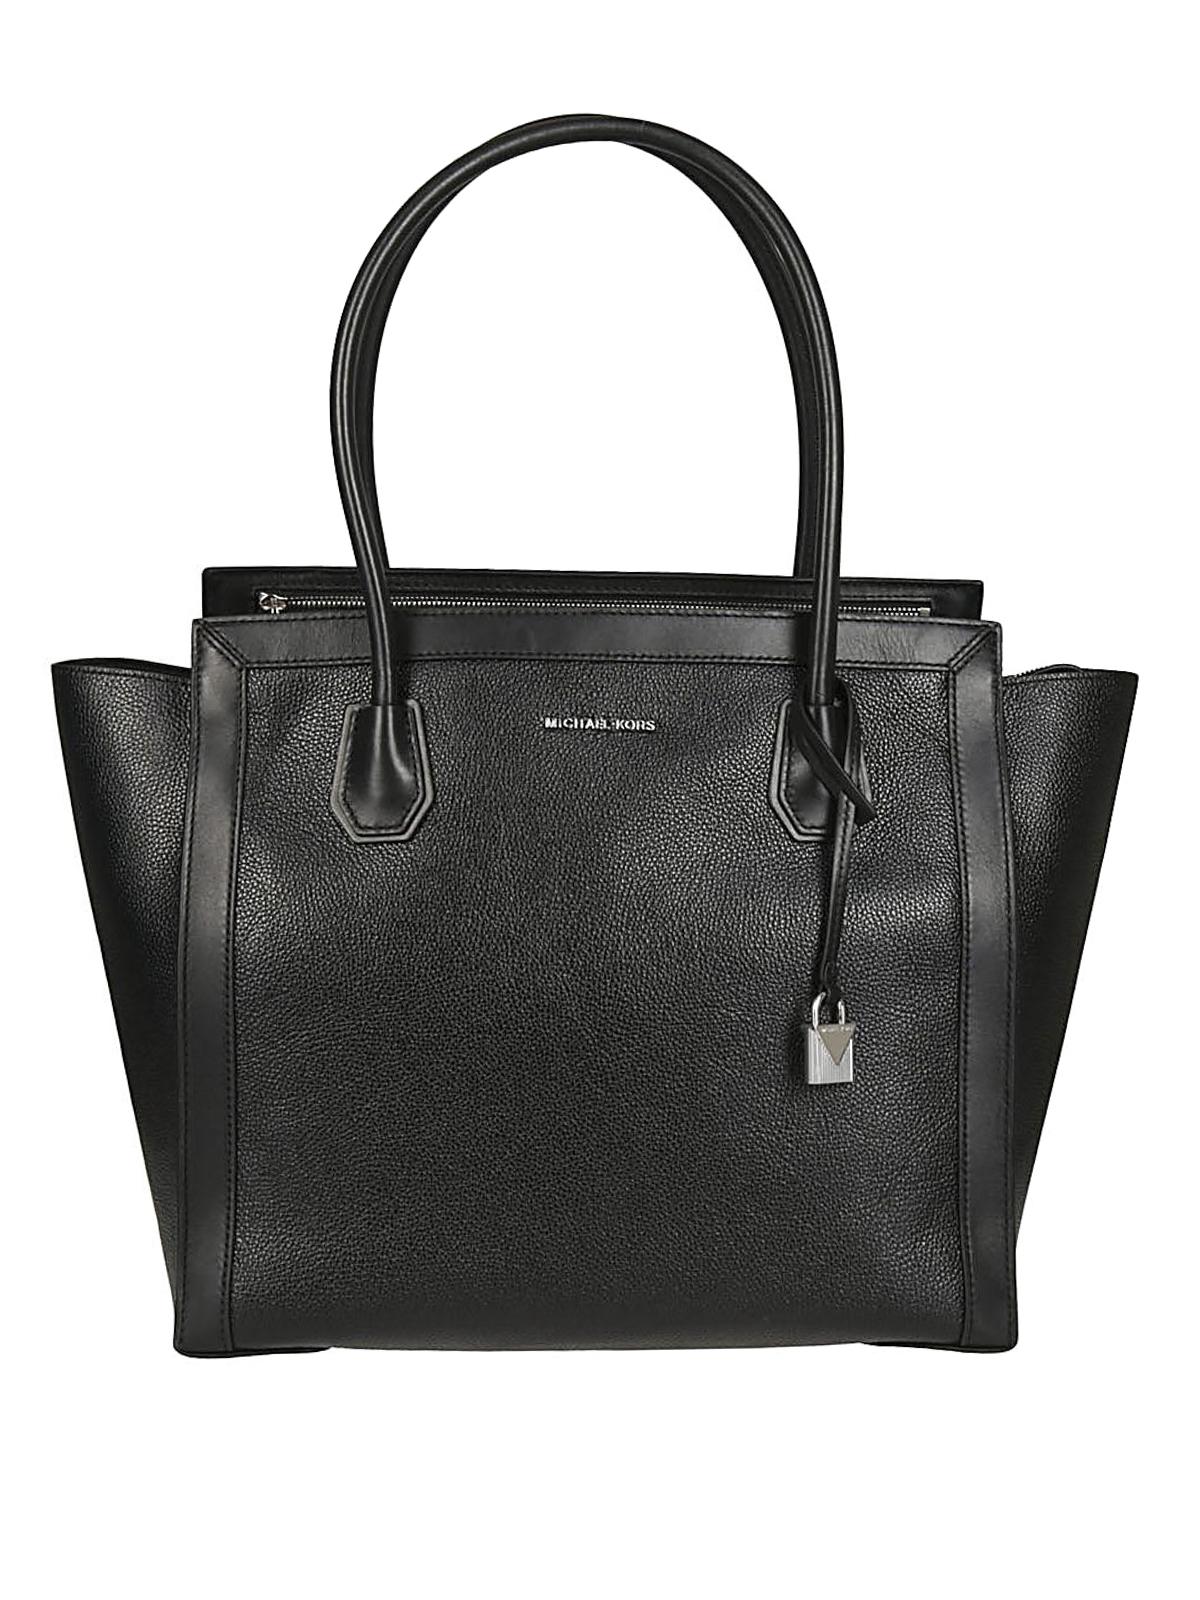 a37f0dc4918f36 Michael Kors - Mercer Studio L black leather tote - totes bags ...